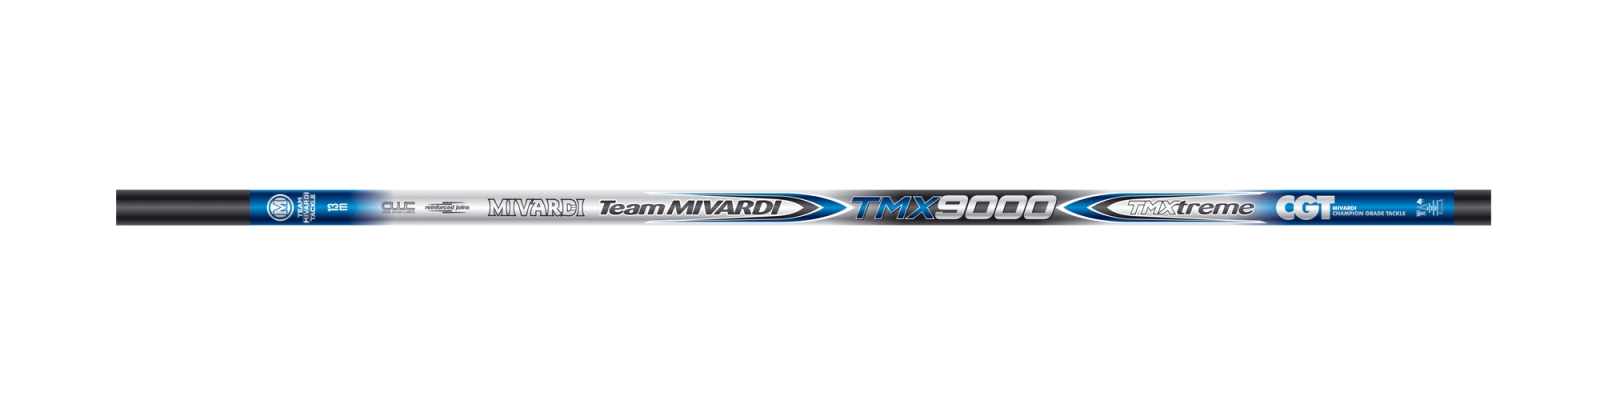 Originální špička na děličku Team Mivardi TMX 9000